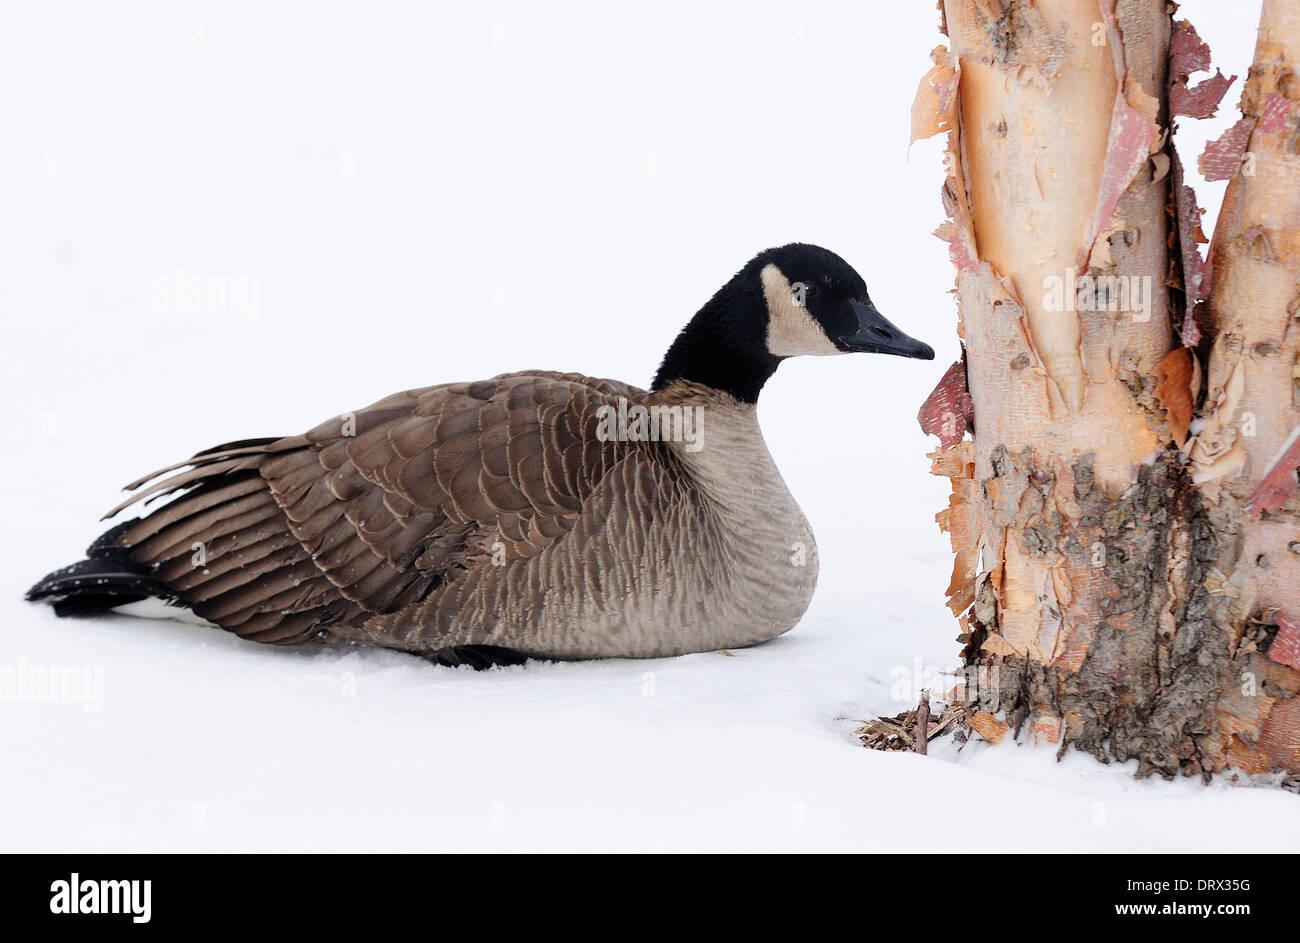 Lone Canadian goose next to birchbark tree. - Stock Image